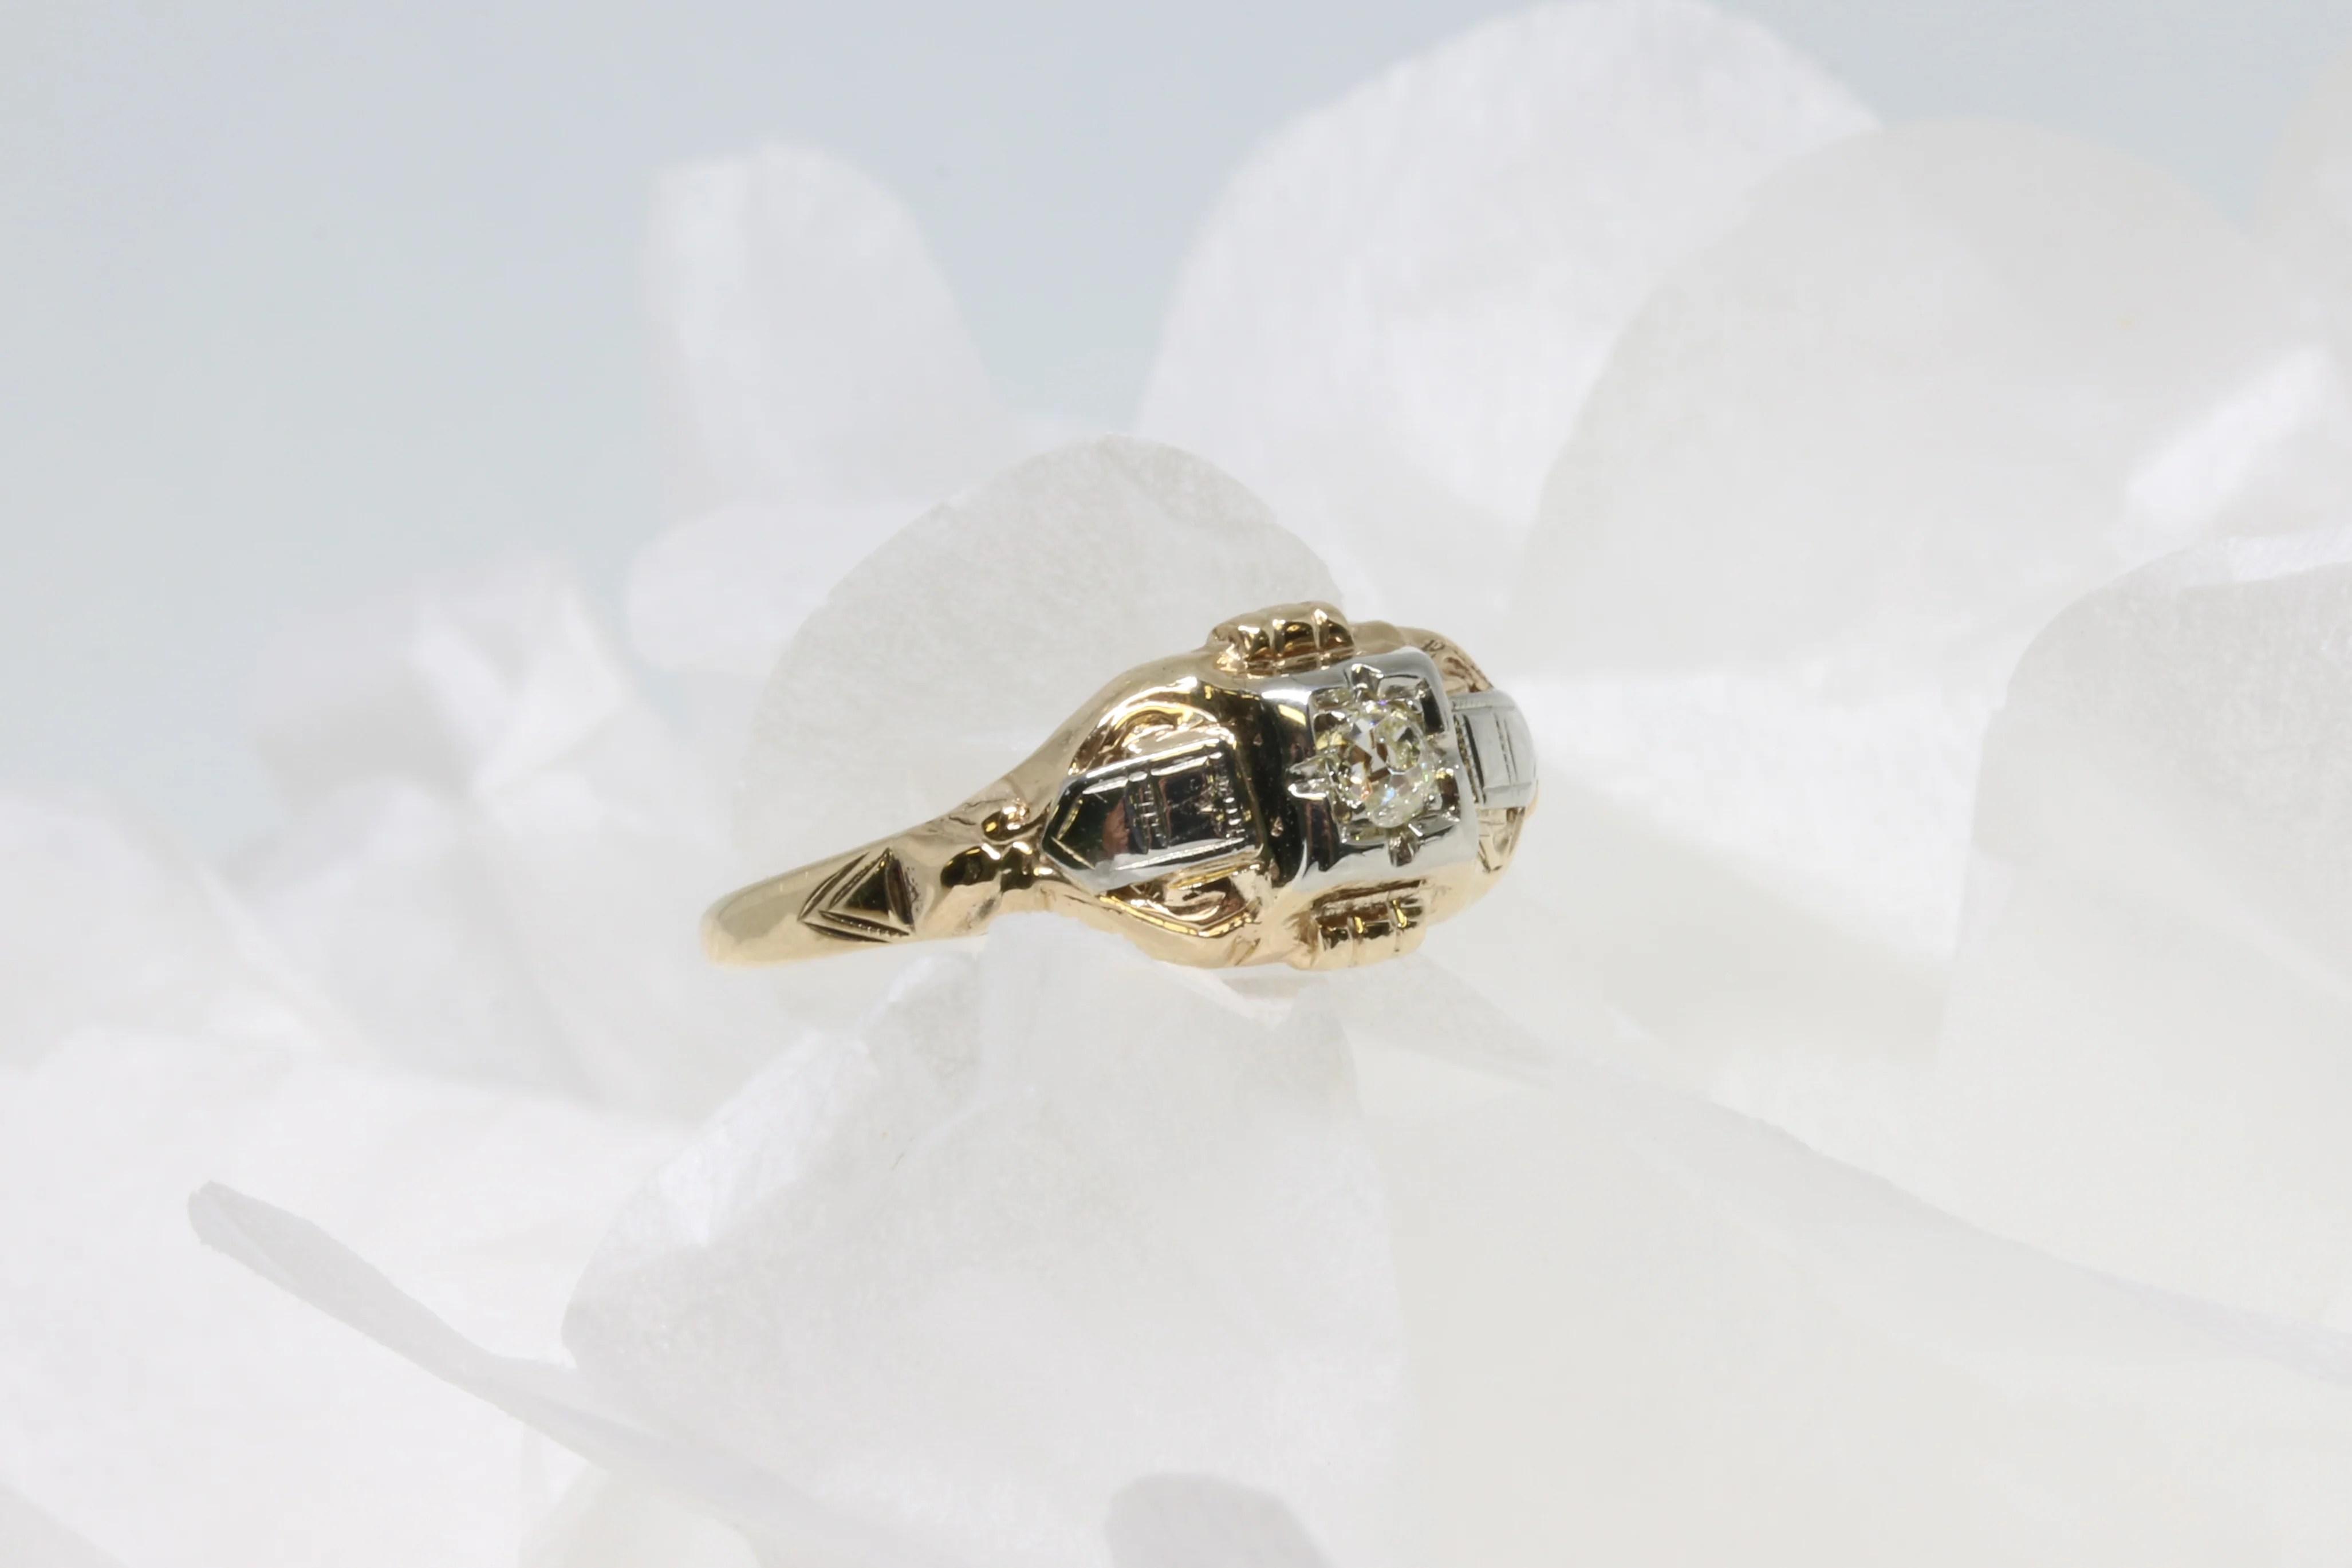 Absorbing Art Deco Illusion Set Diamond Ring Vintage Engagement Ring Styles Love Atique Engagement Ring Styles Through History Engagement Ring Styles Through Decades wedding rings Engagement Ring Styles